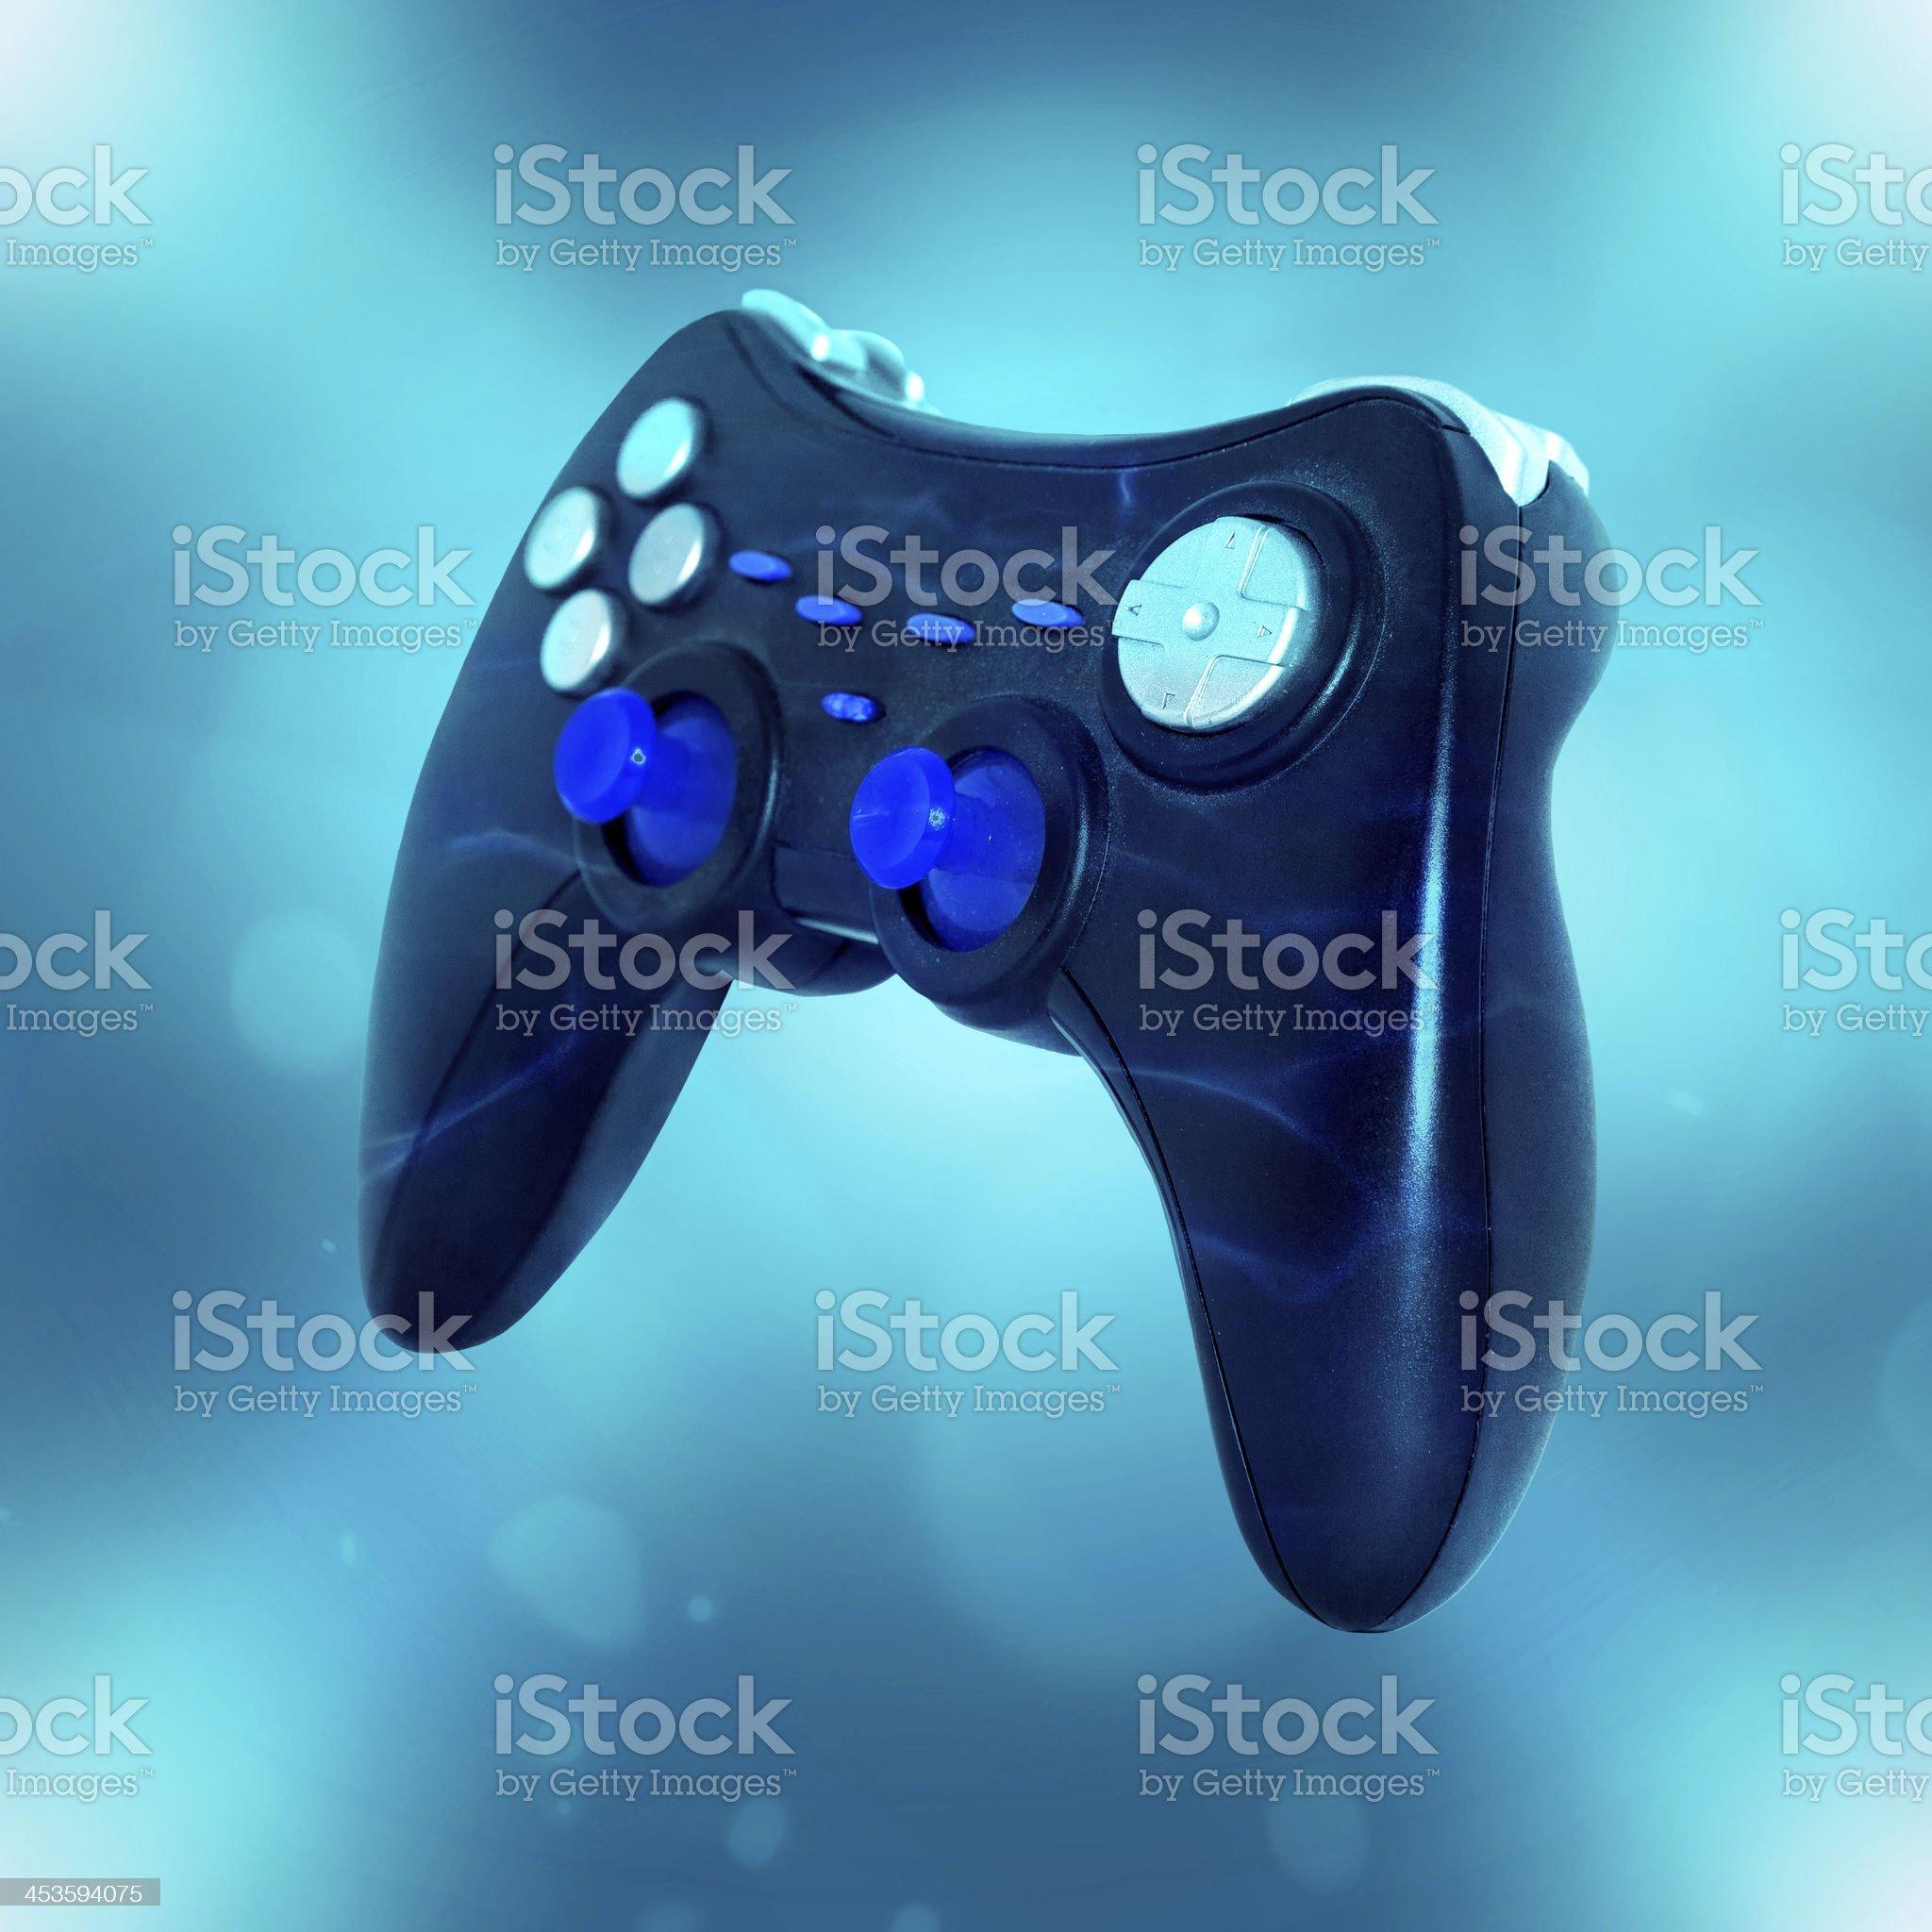 Square photo of joystick on blue background royalty-free stock photo